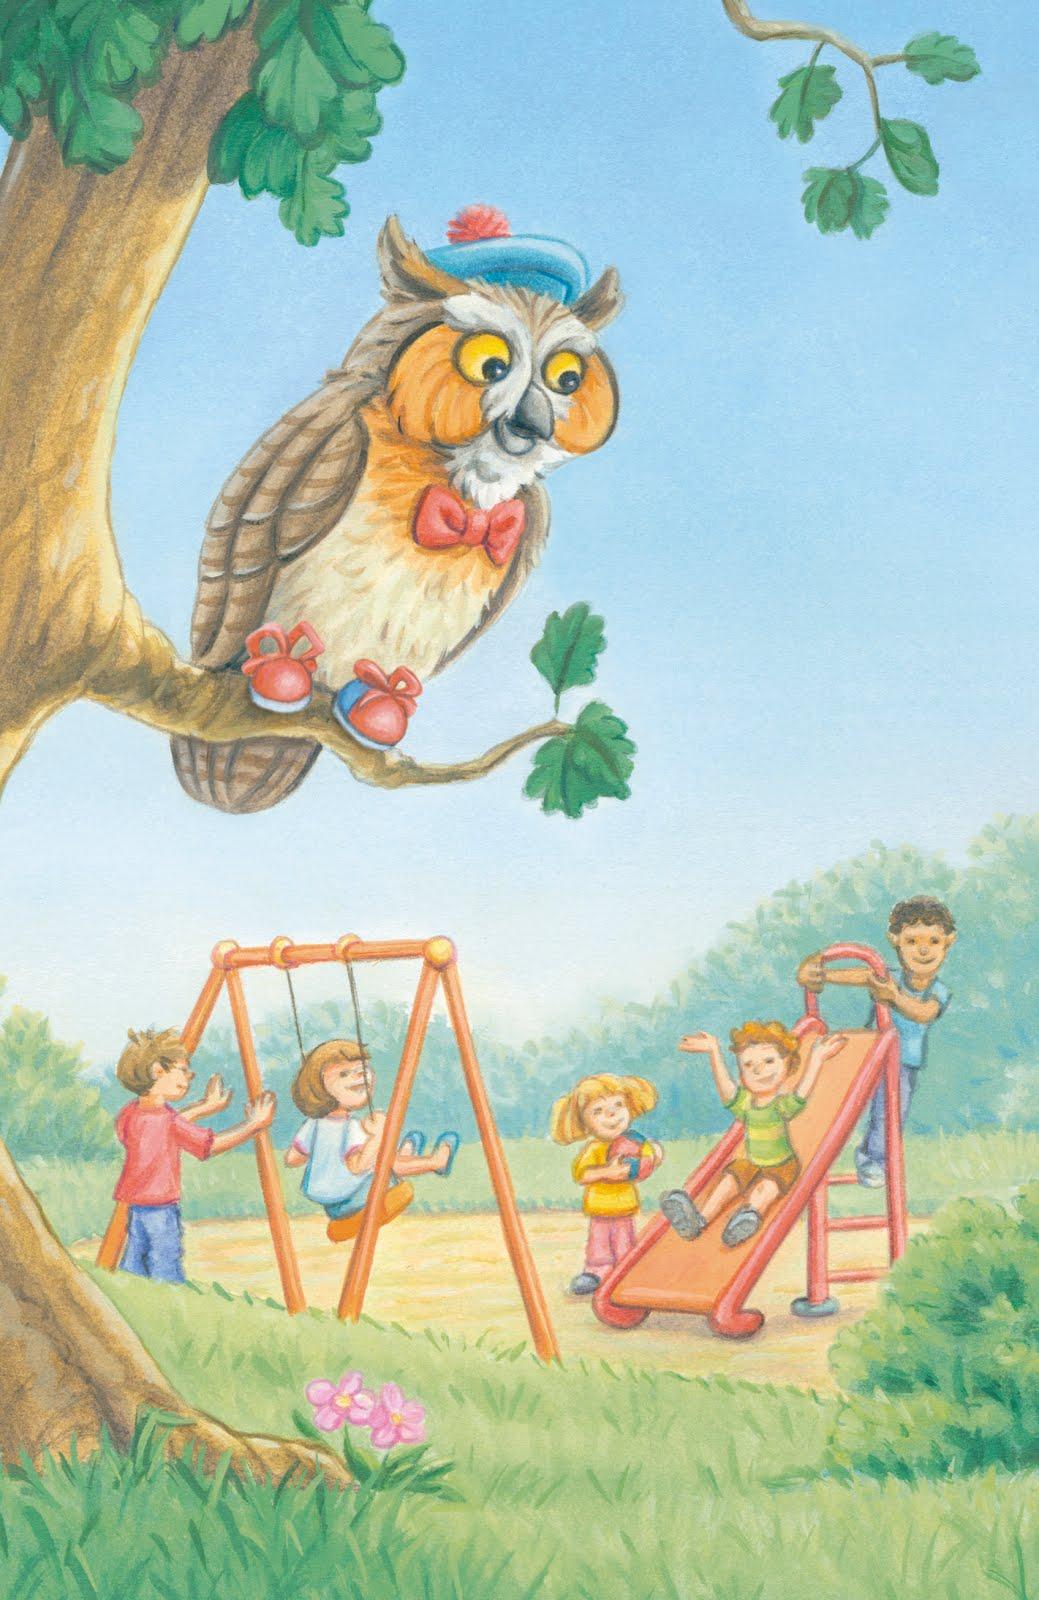 Hoot hoot said Albert owl